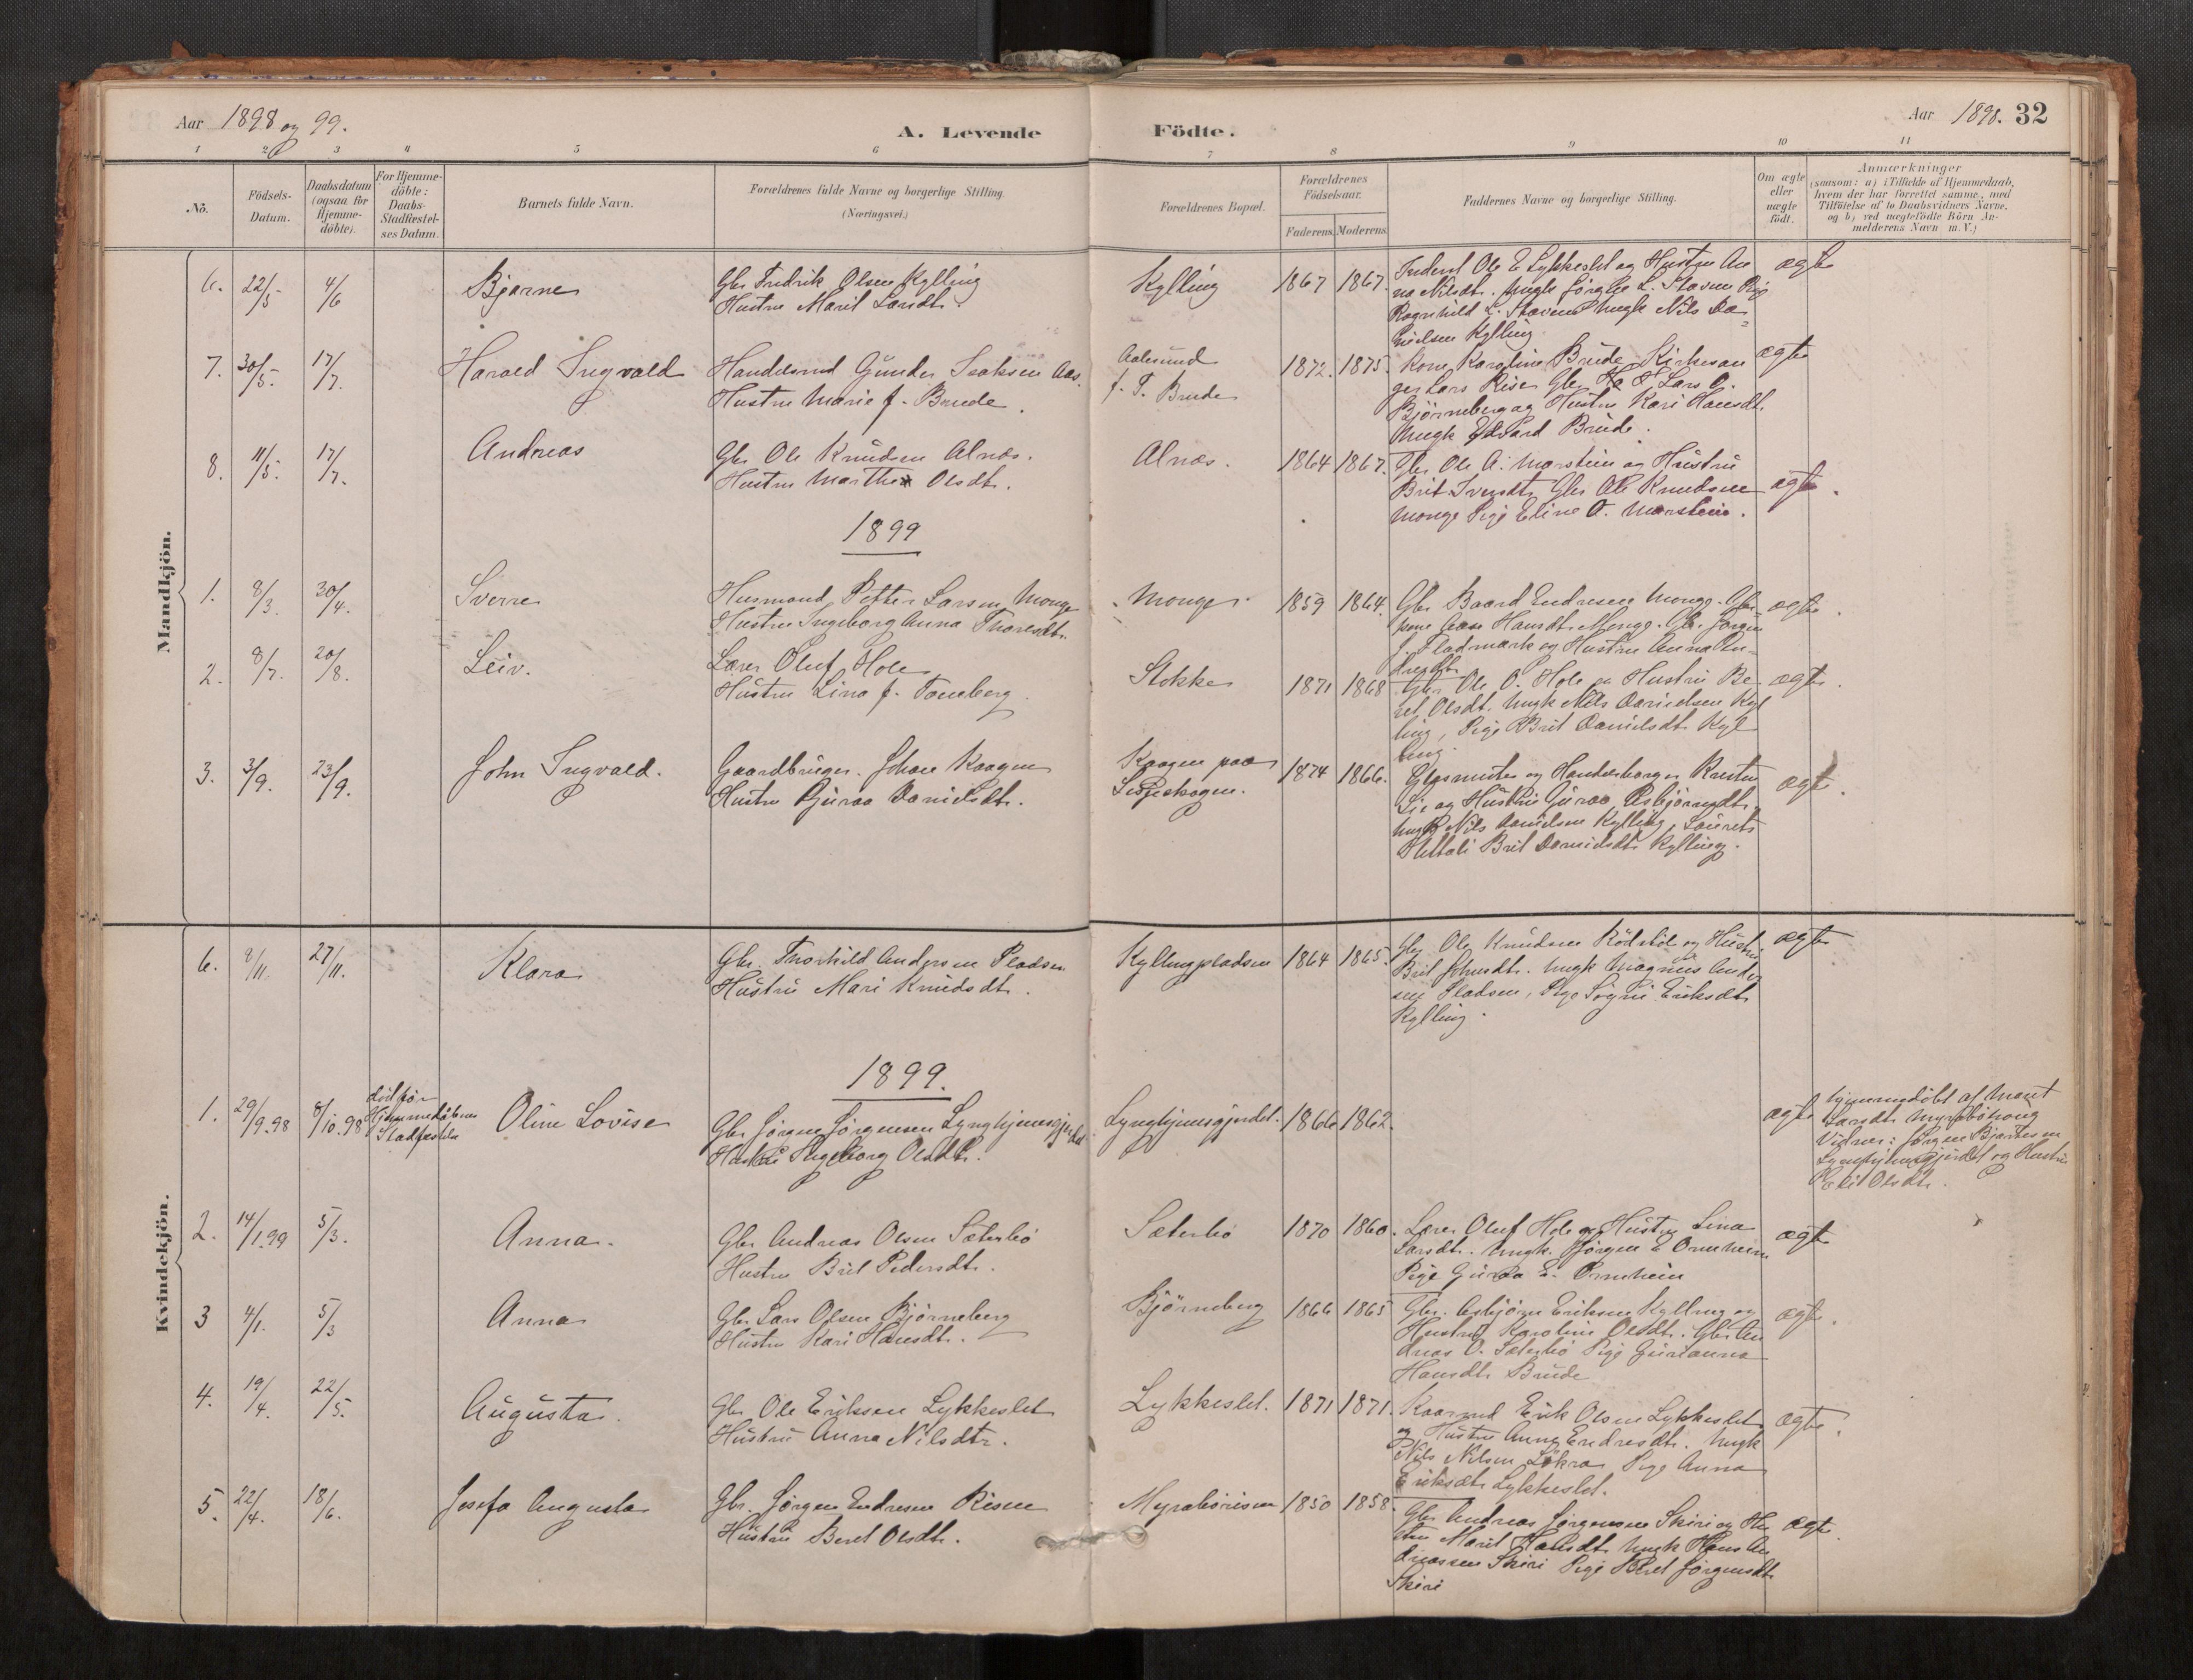 SAT, Grytten sokneprestkontor, Ministerialbok nr. 546A03, 1882-1920, s. 32